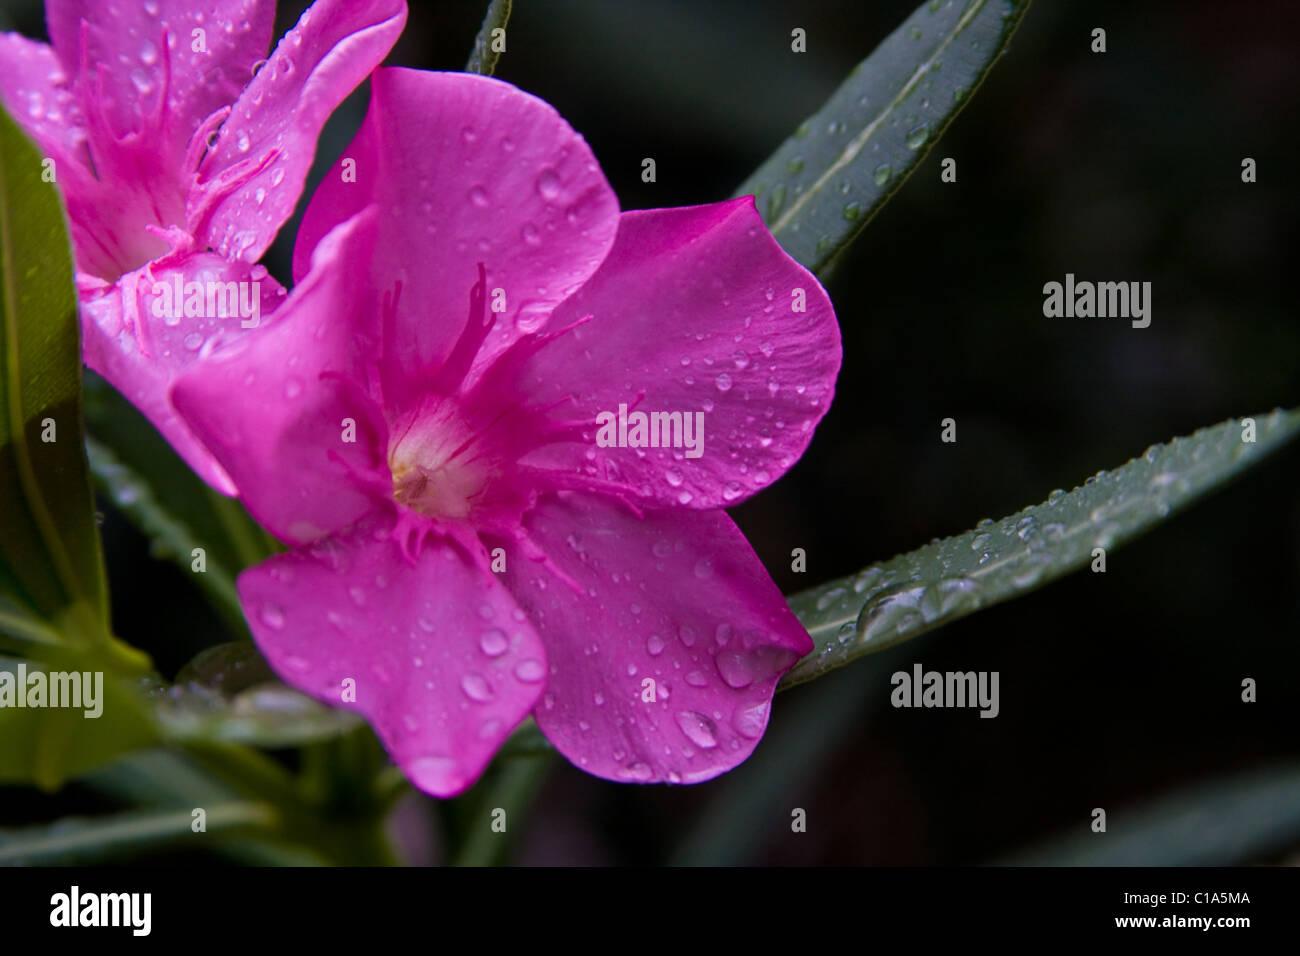 Purple oleander stock photos purple oleander stock images alamy beautiful but poisonous oleander flower blossoms stock image izmirmasajfo